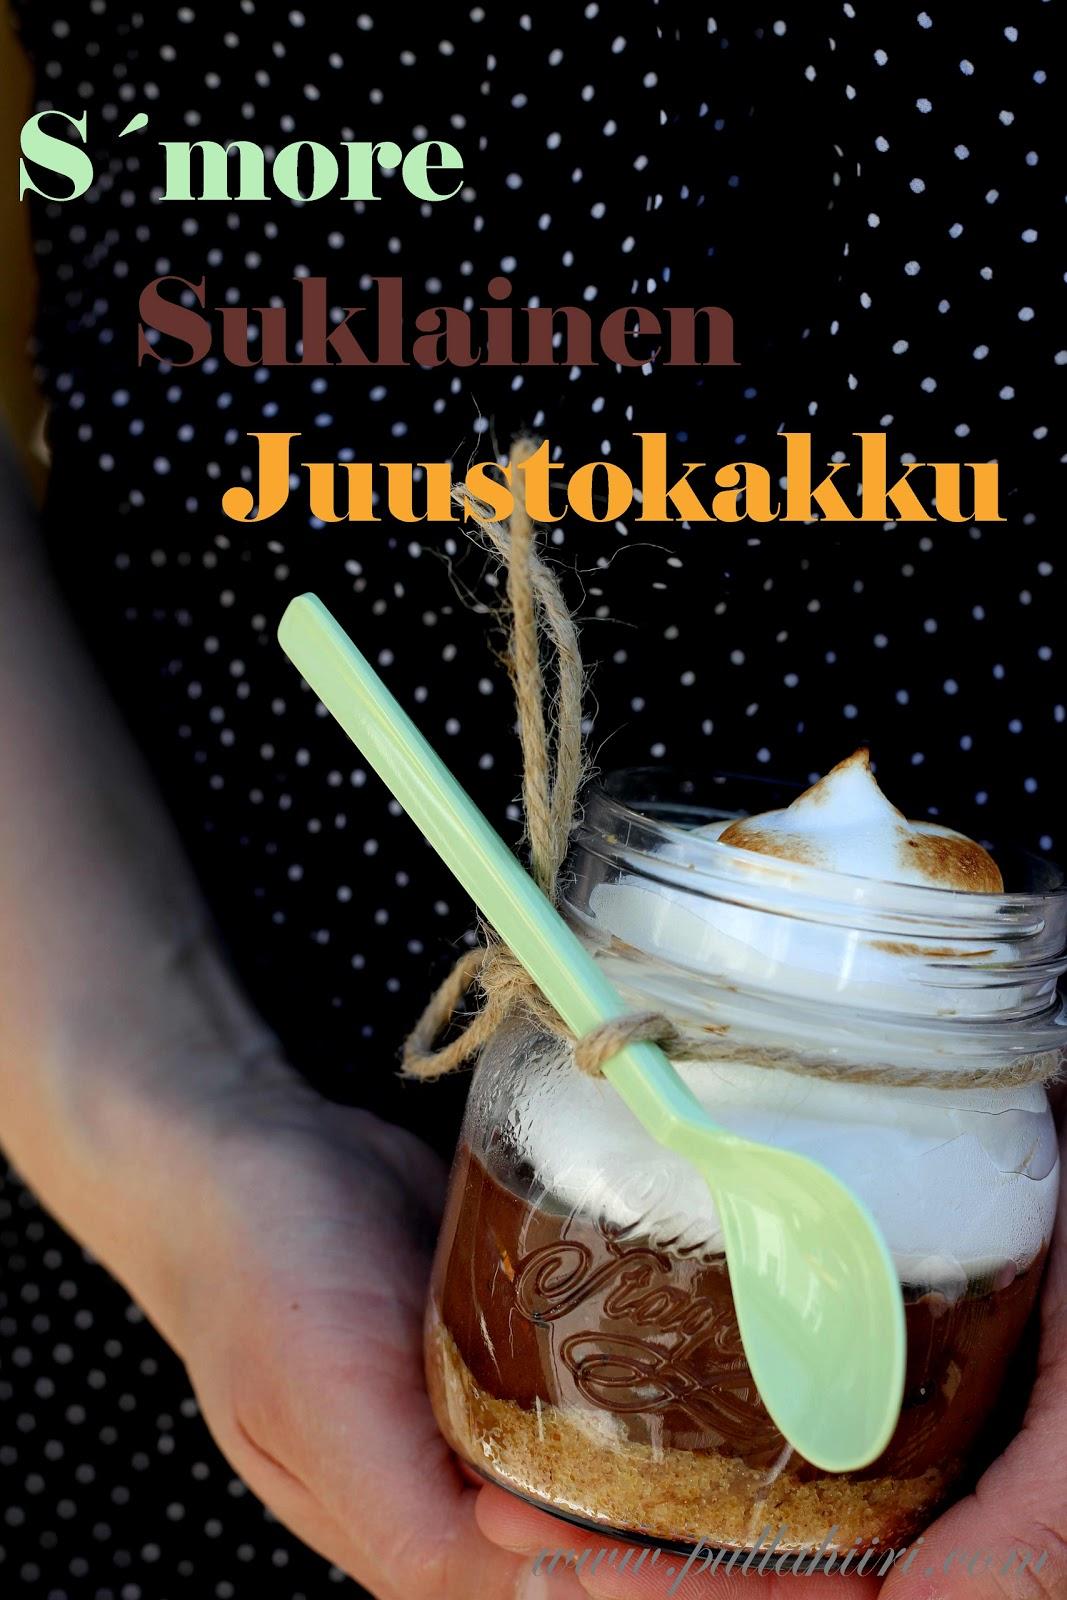 http://www.pullahiiri.com/2013/05/smore-suklainen-juustokakku.html